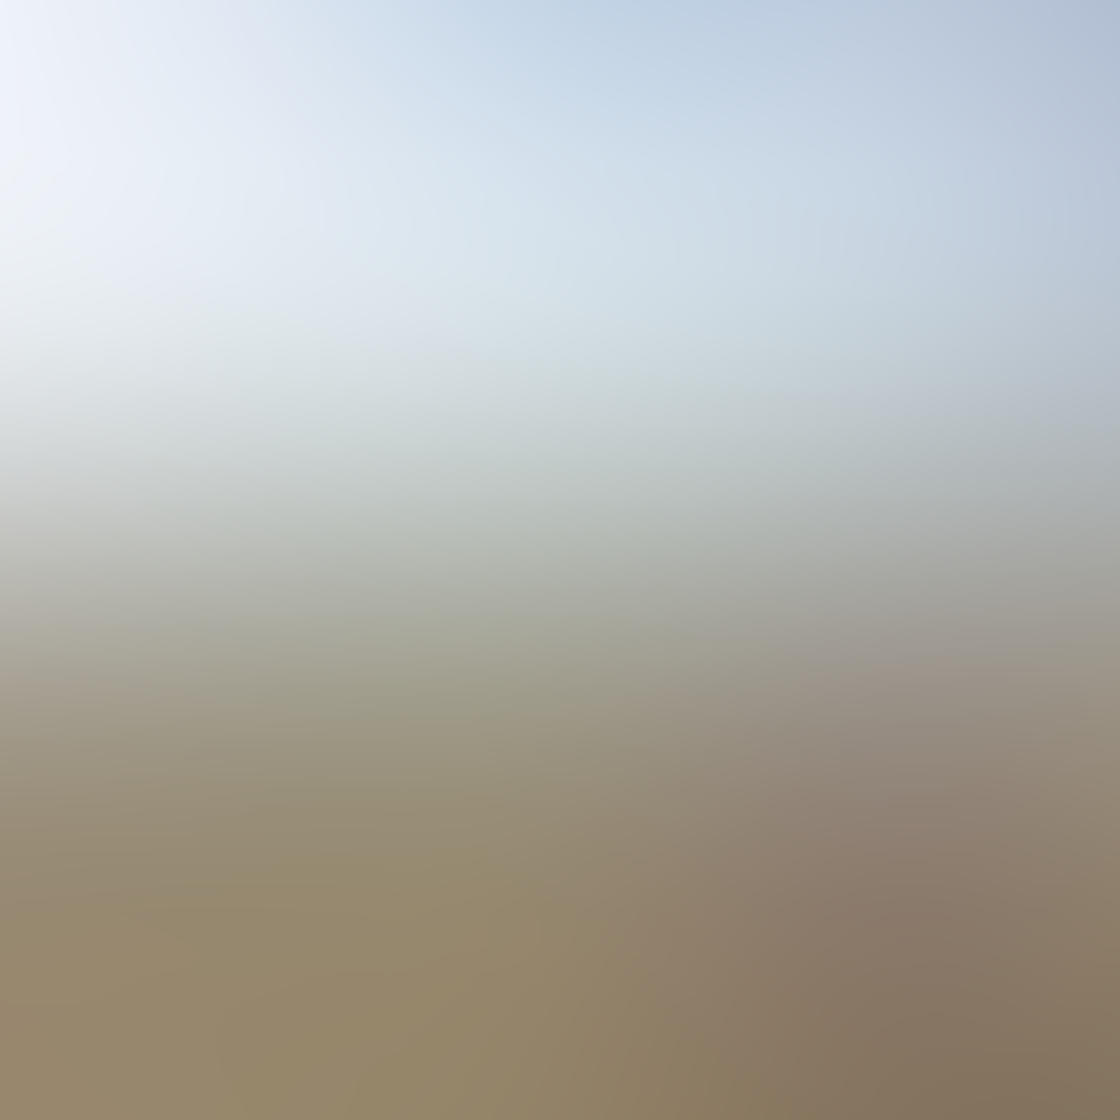 Vsco filters 26